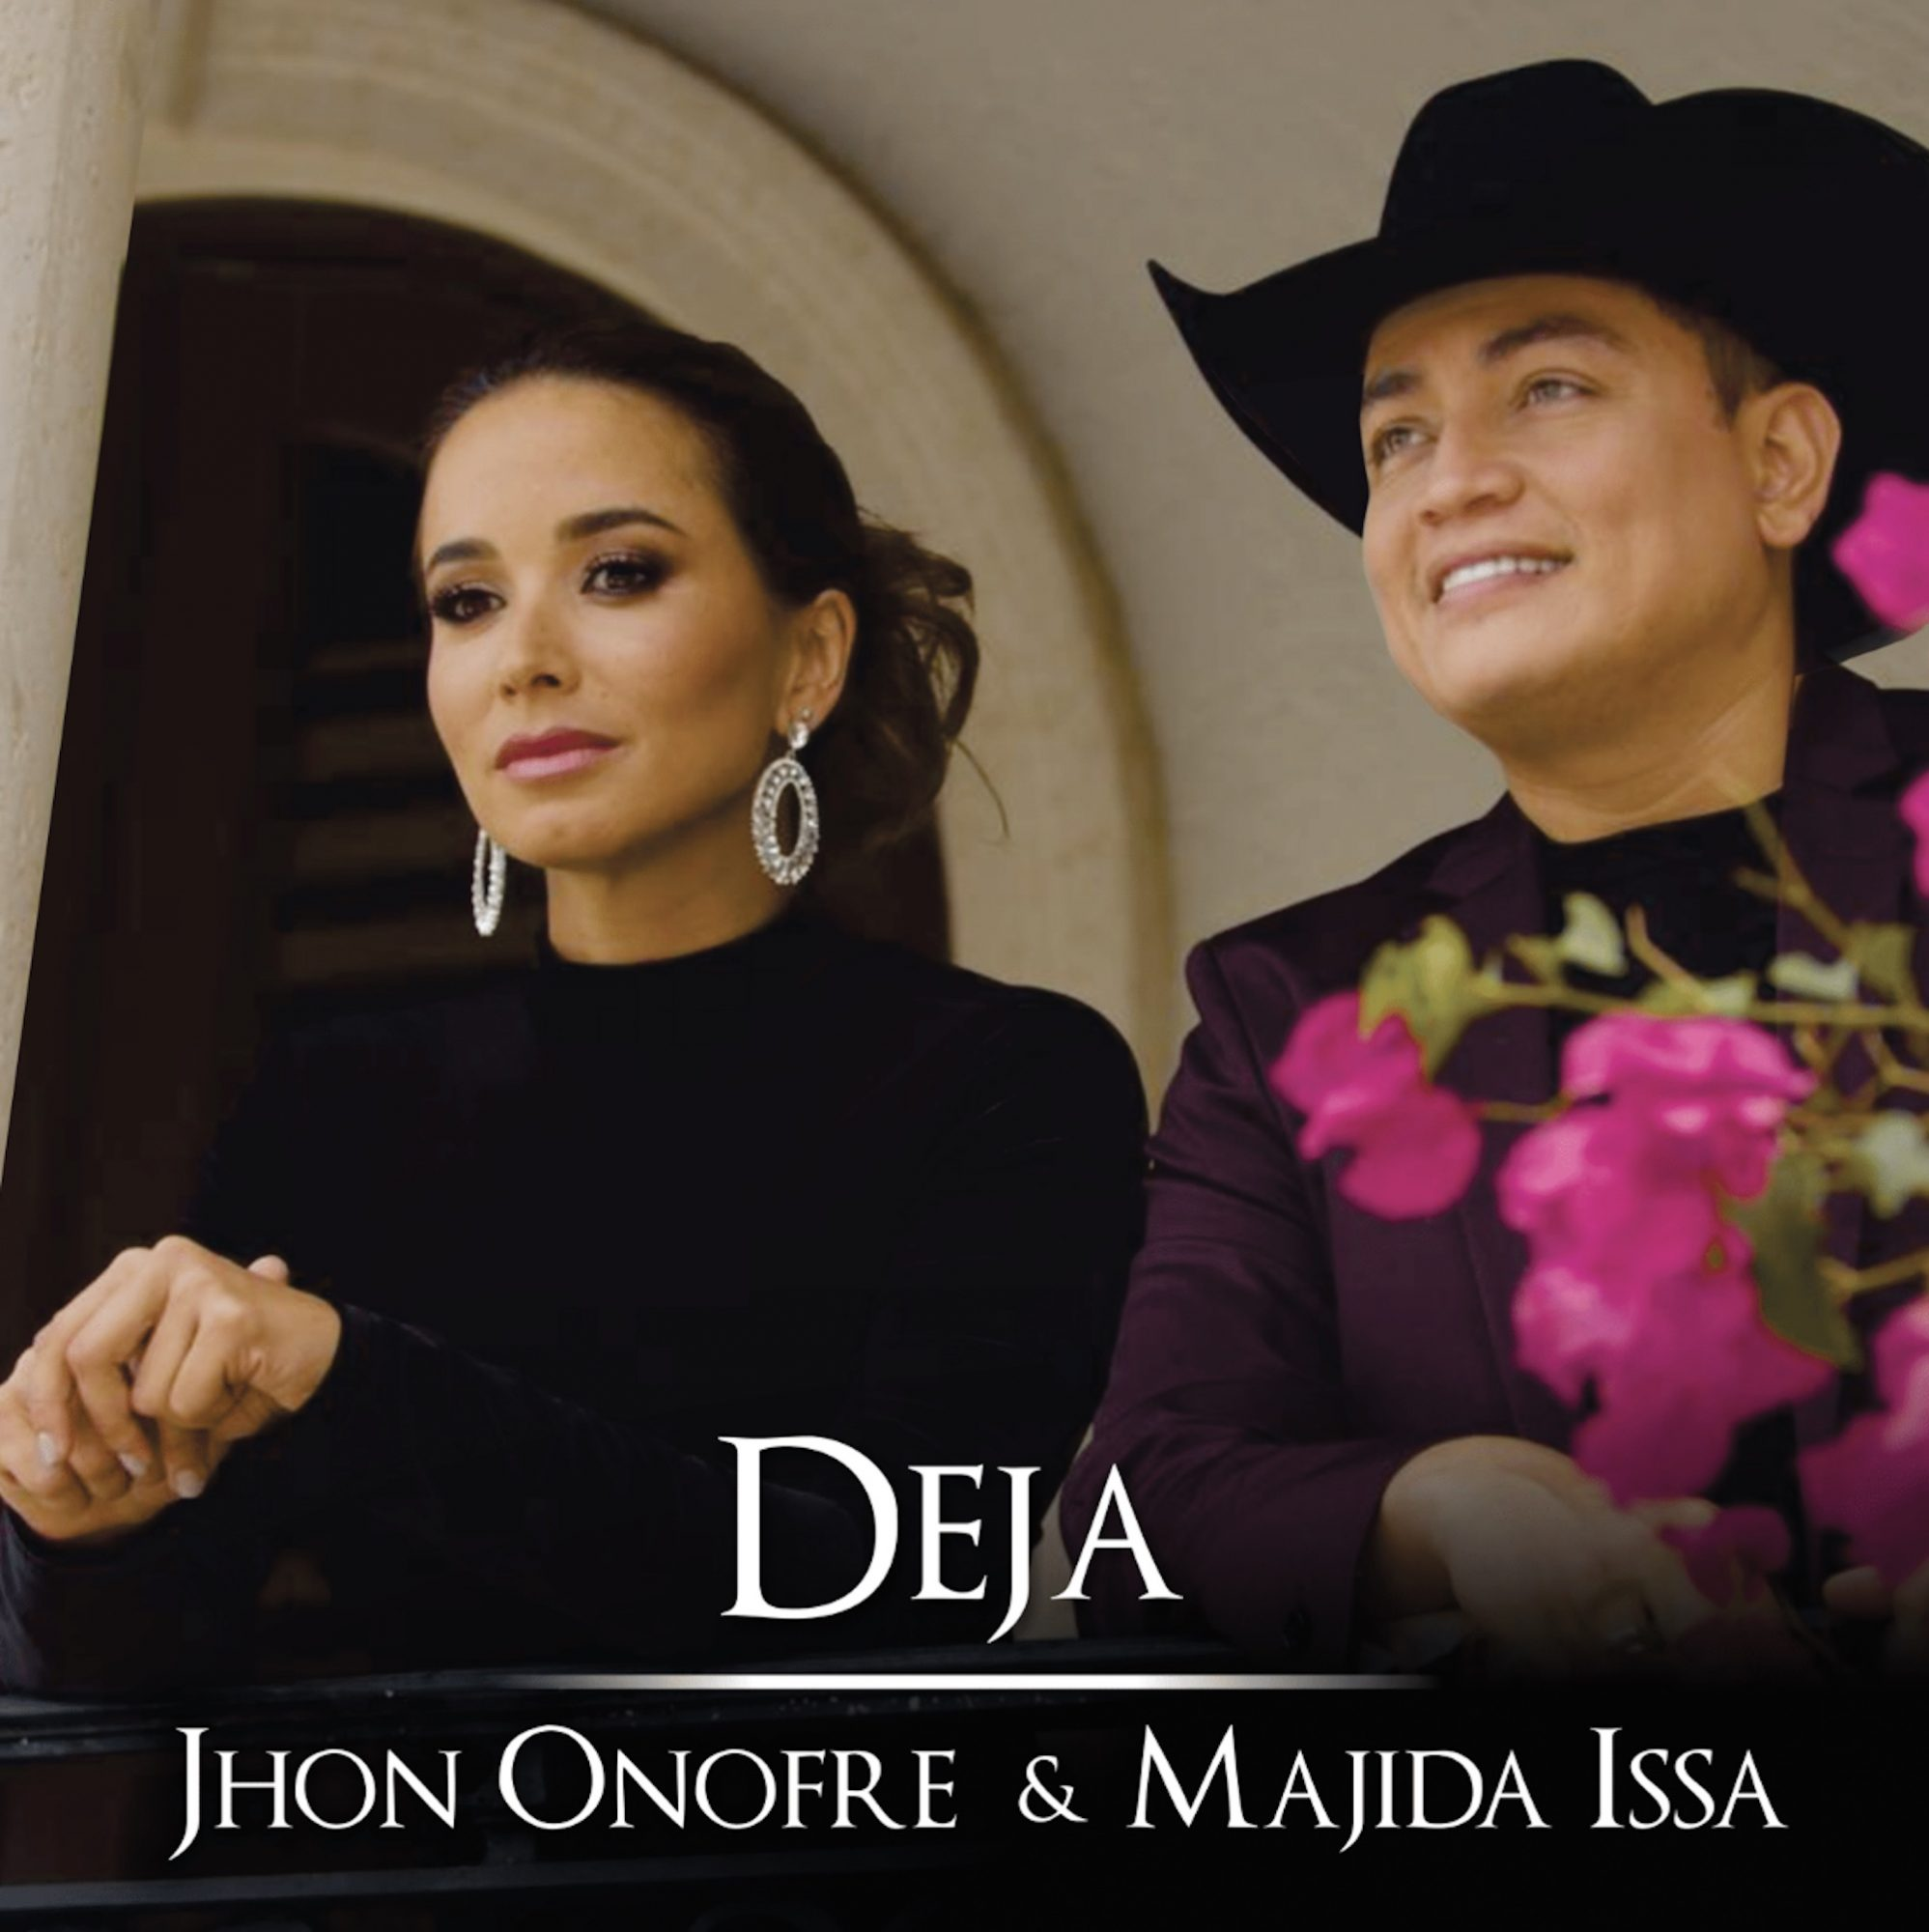 Majida Issa y Jhon Onofre